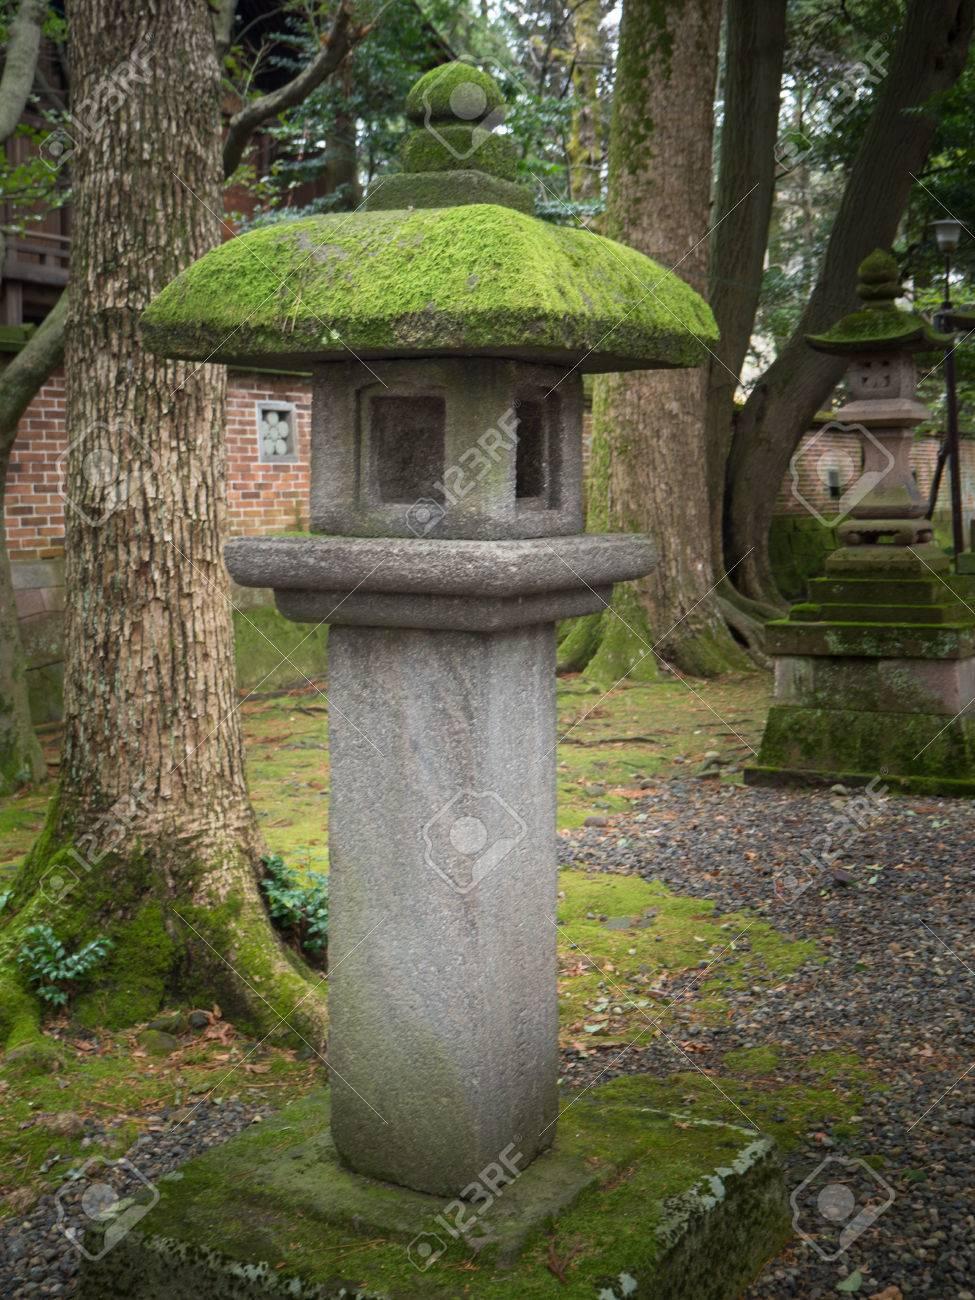 banque dimages lanterne jardin amnagement paysager et dcorer le jardin de style japon - Lanterne De Jardin